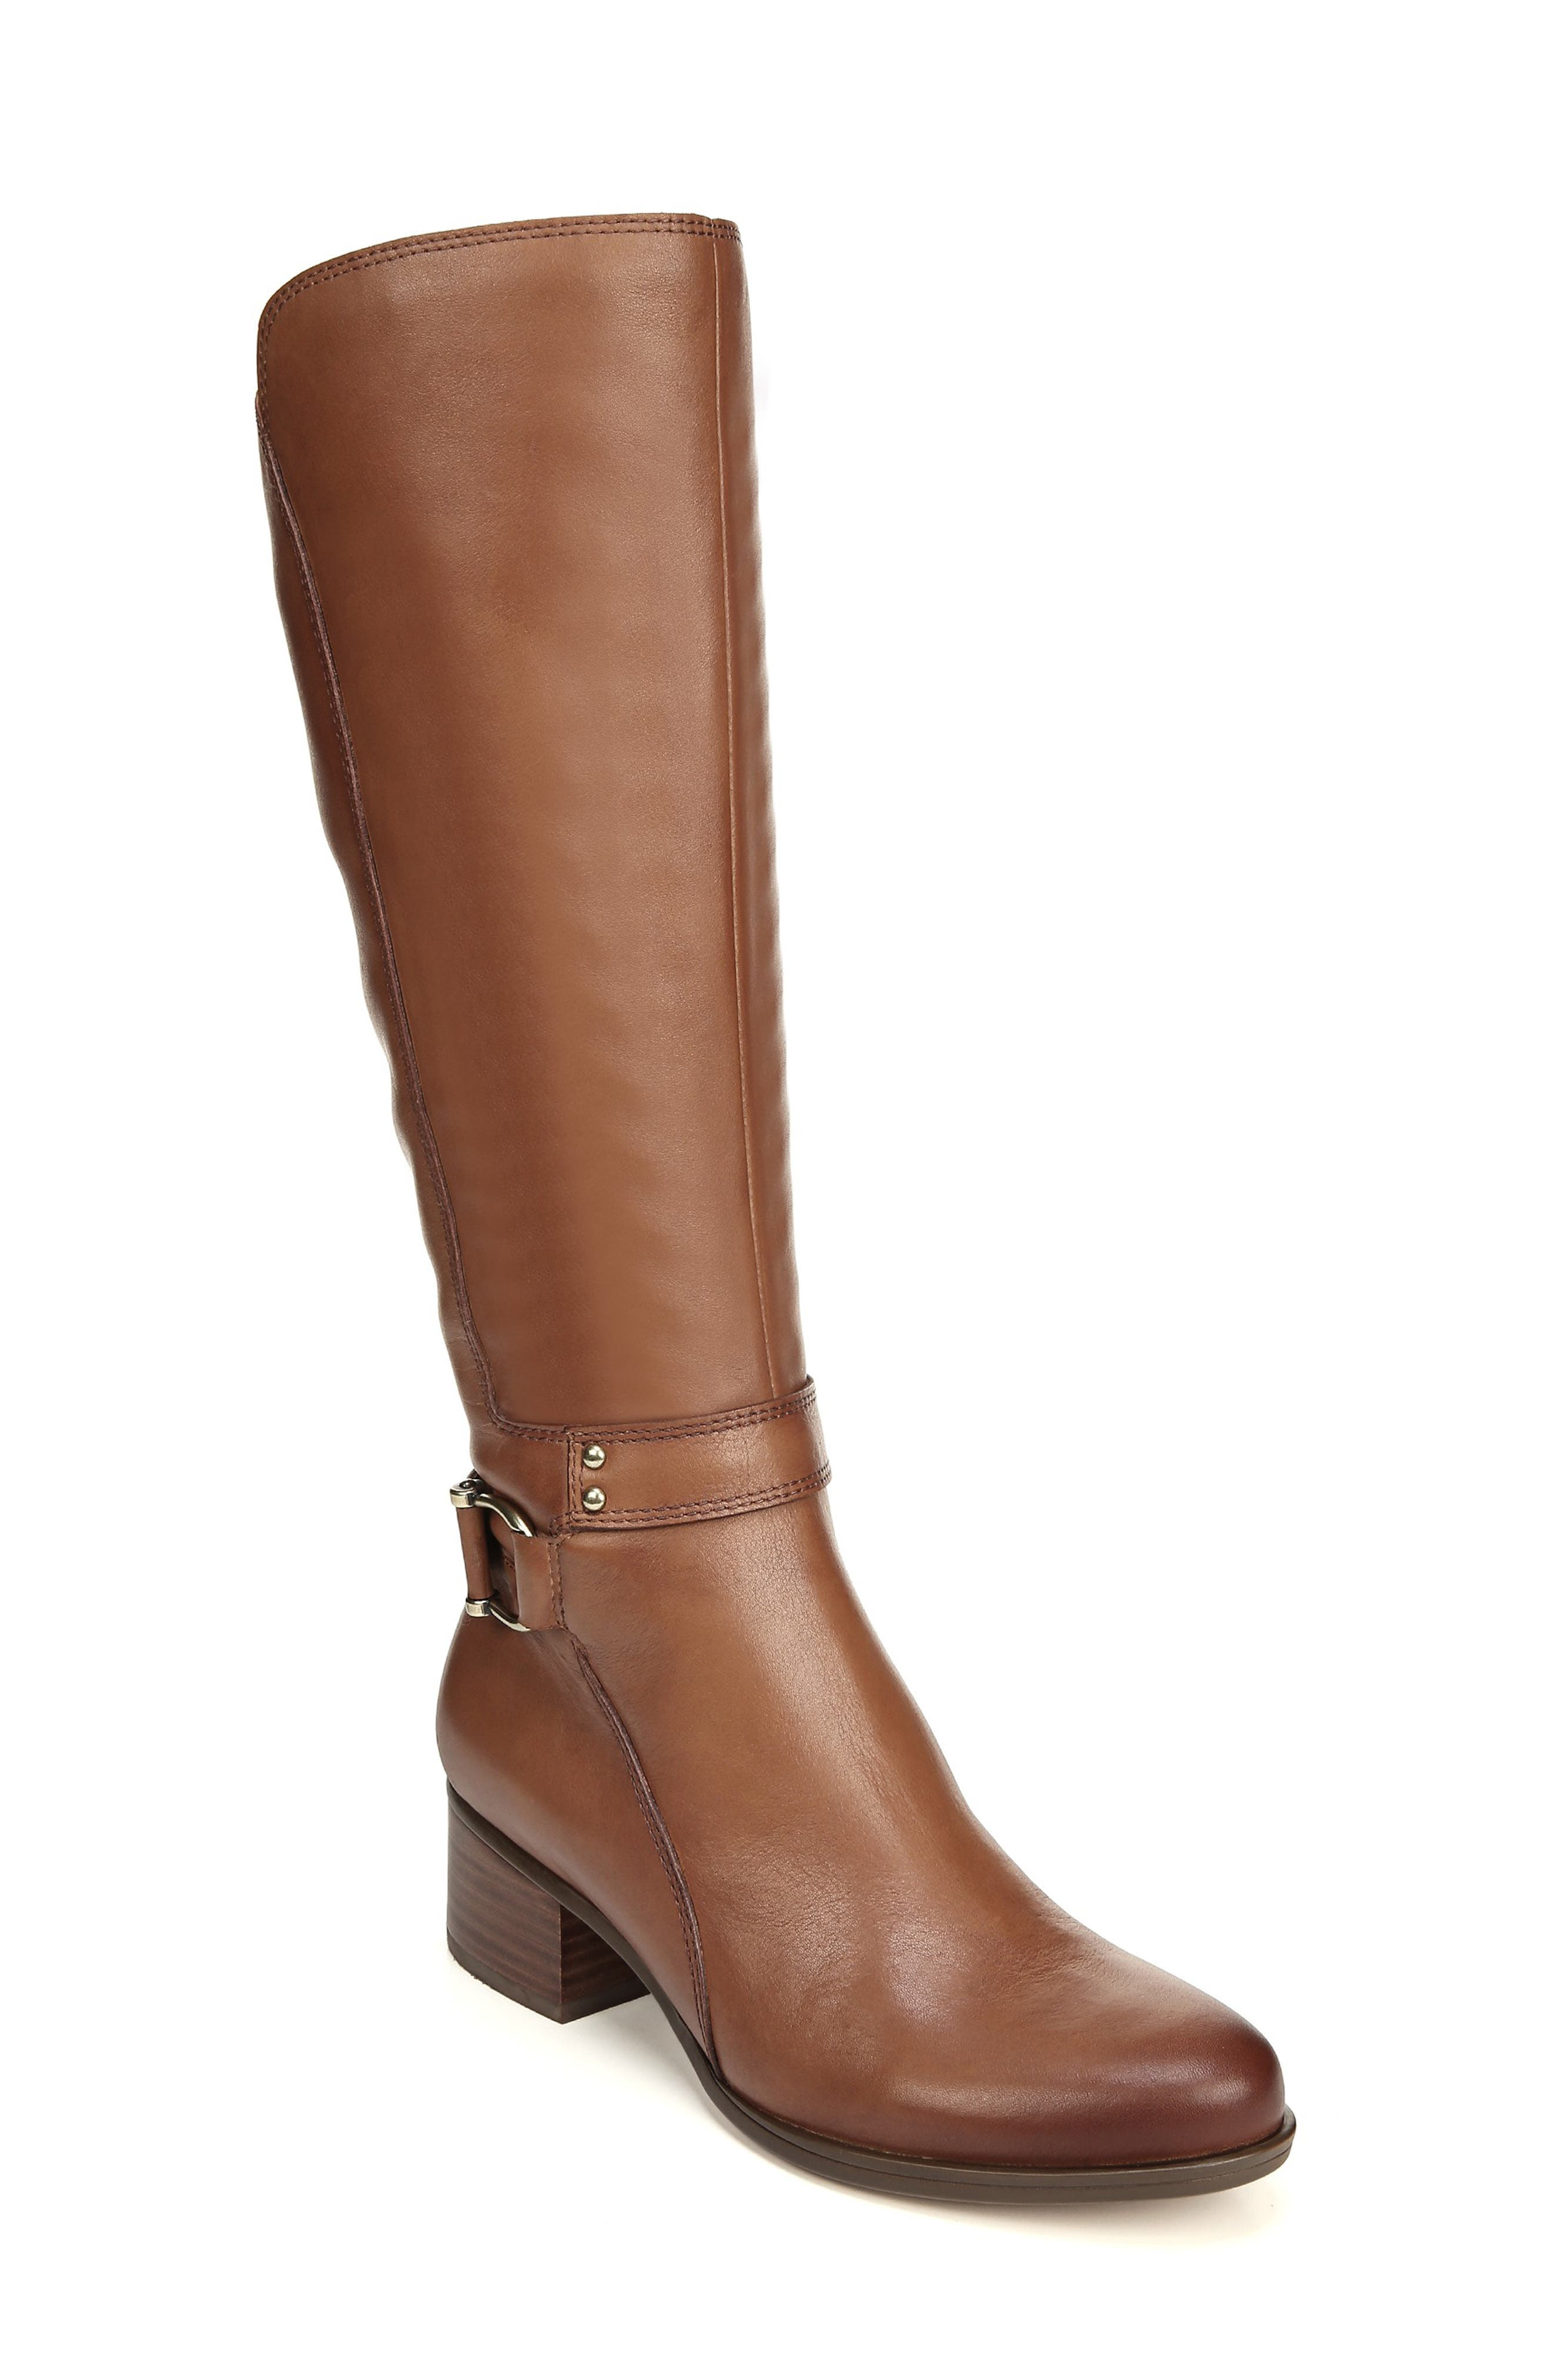 Naturalizer Dane Knee High Riding Boot, Wide Calf- Brown